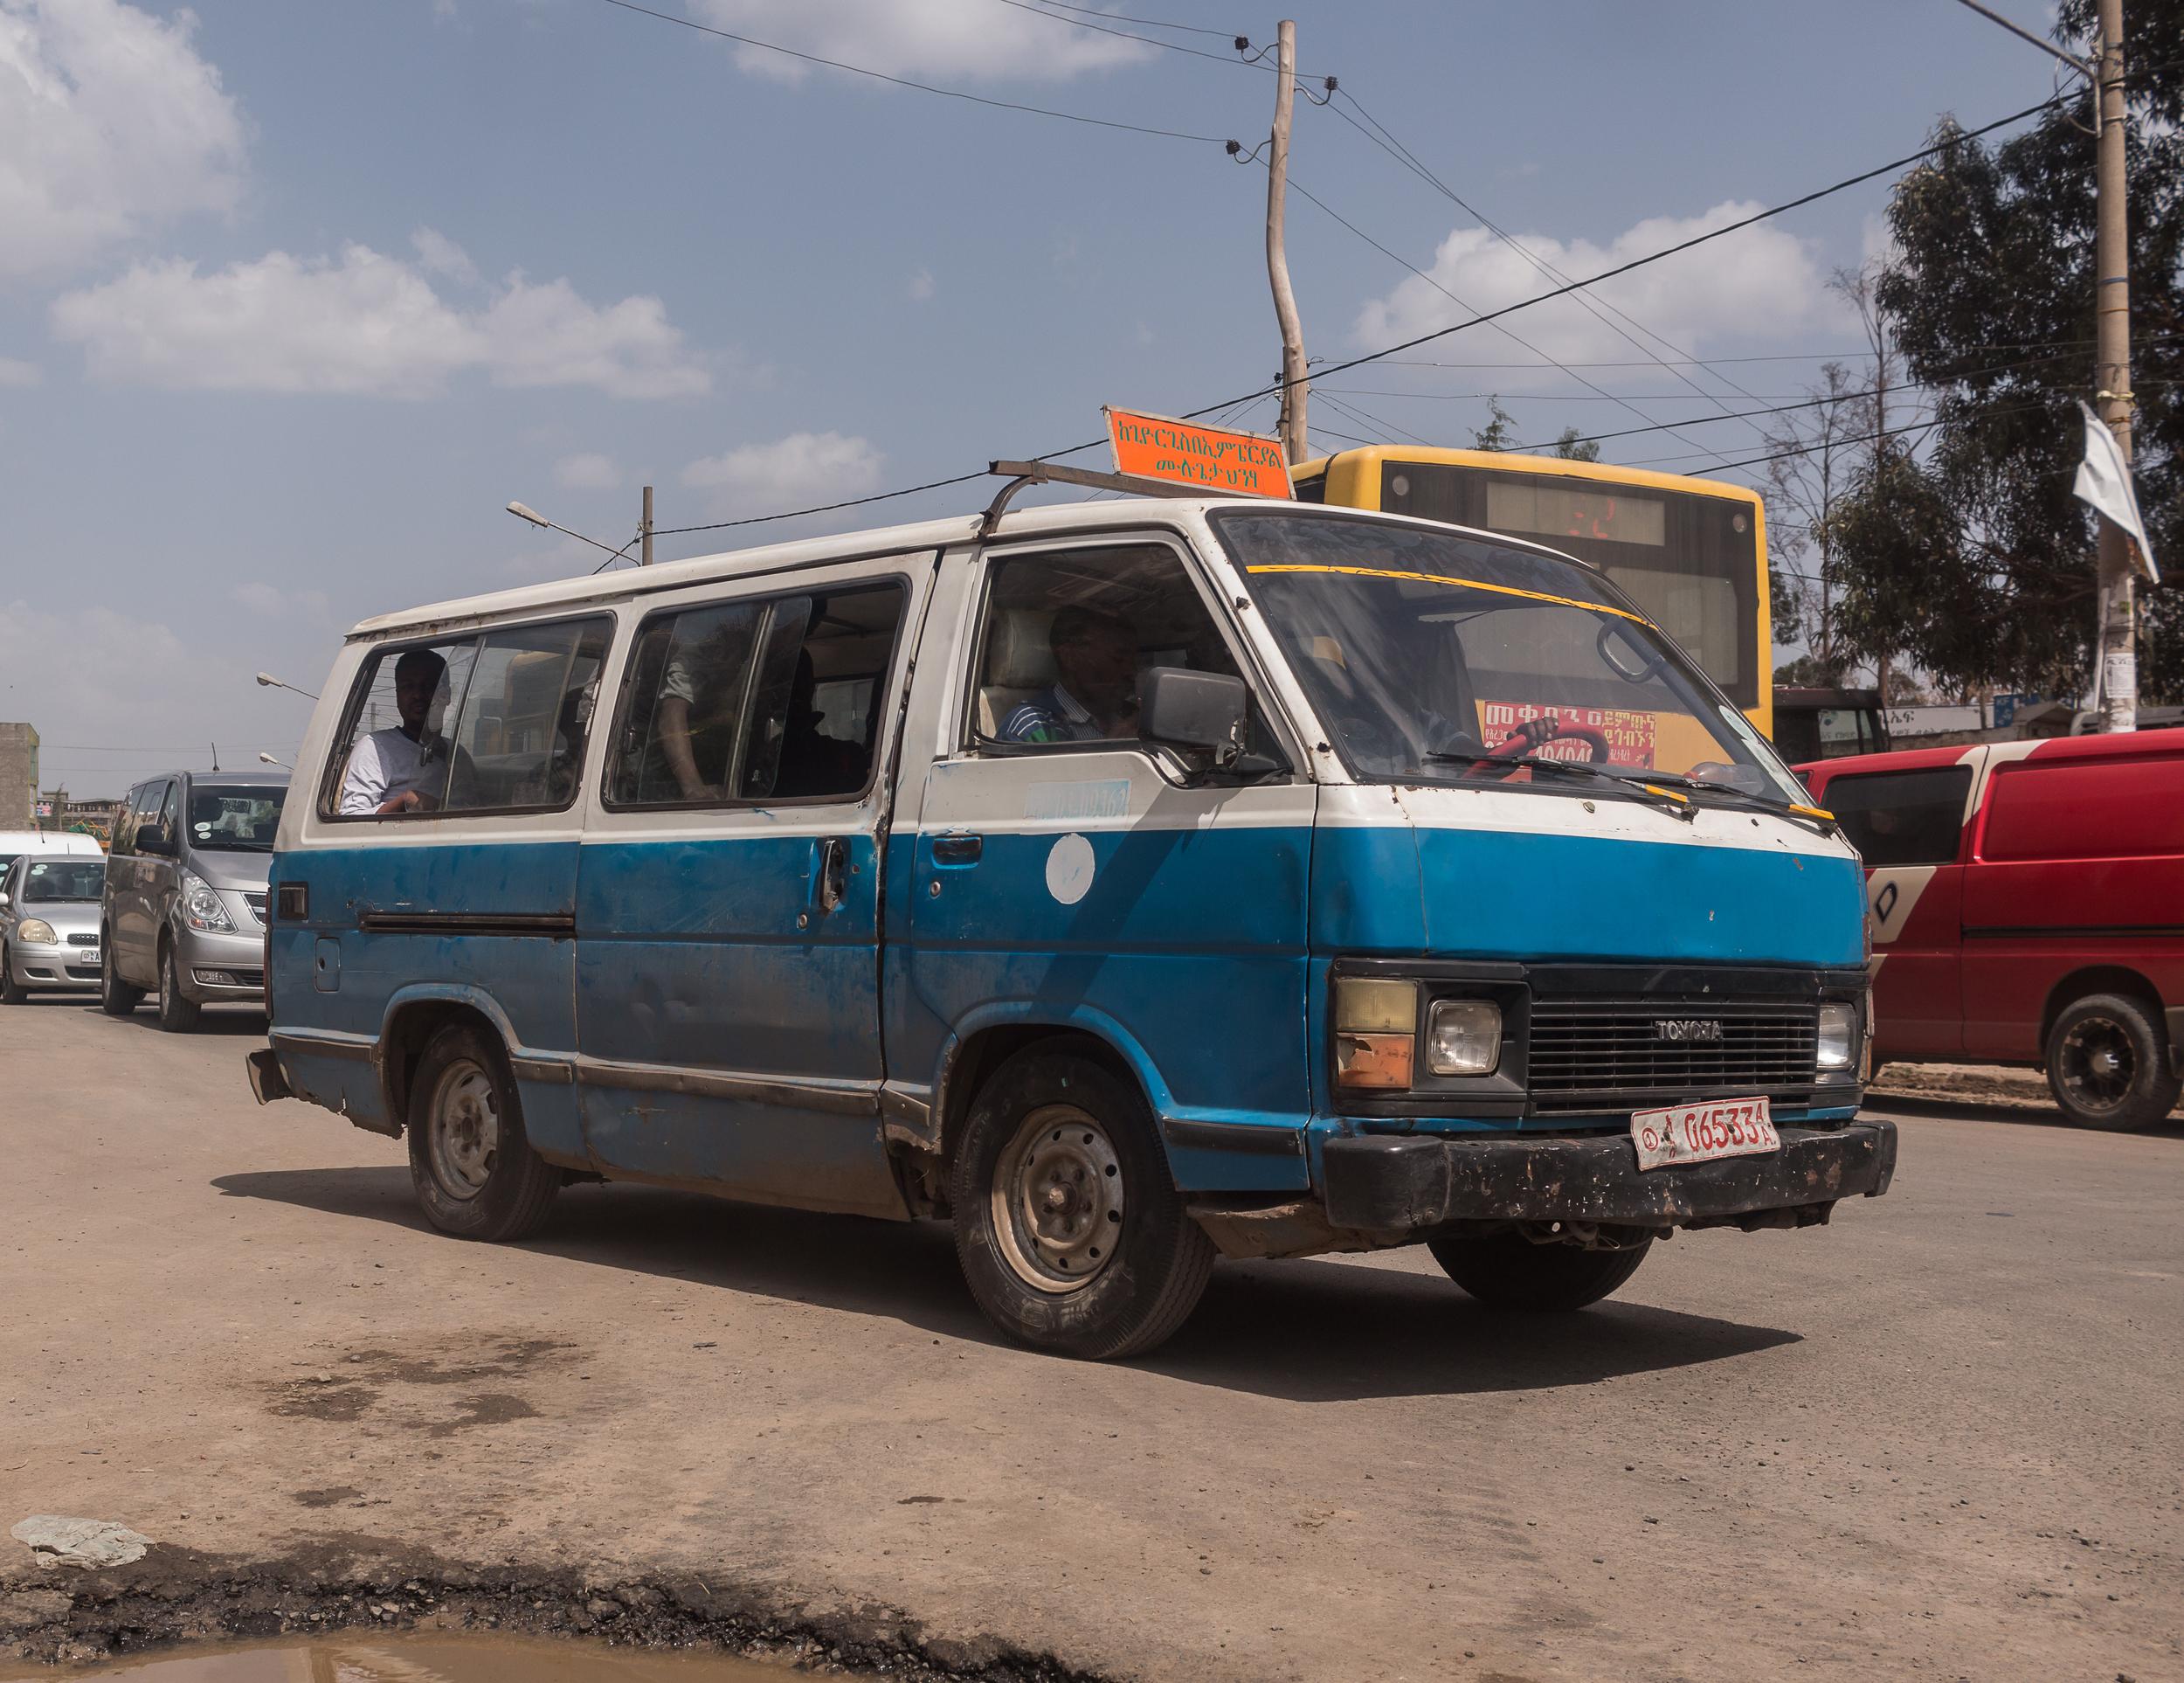 A relatively empty 'mini-bus'